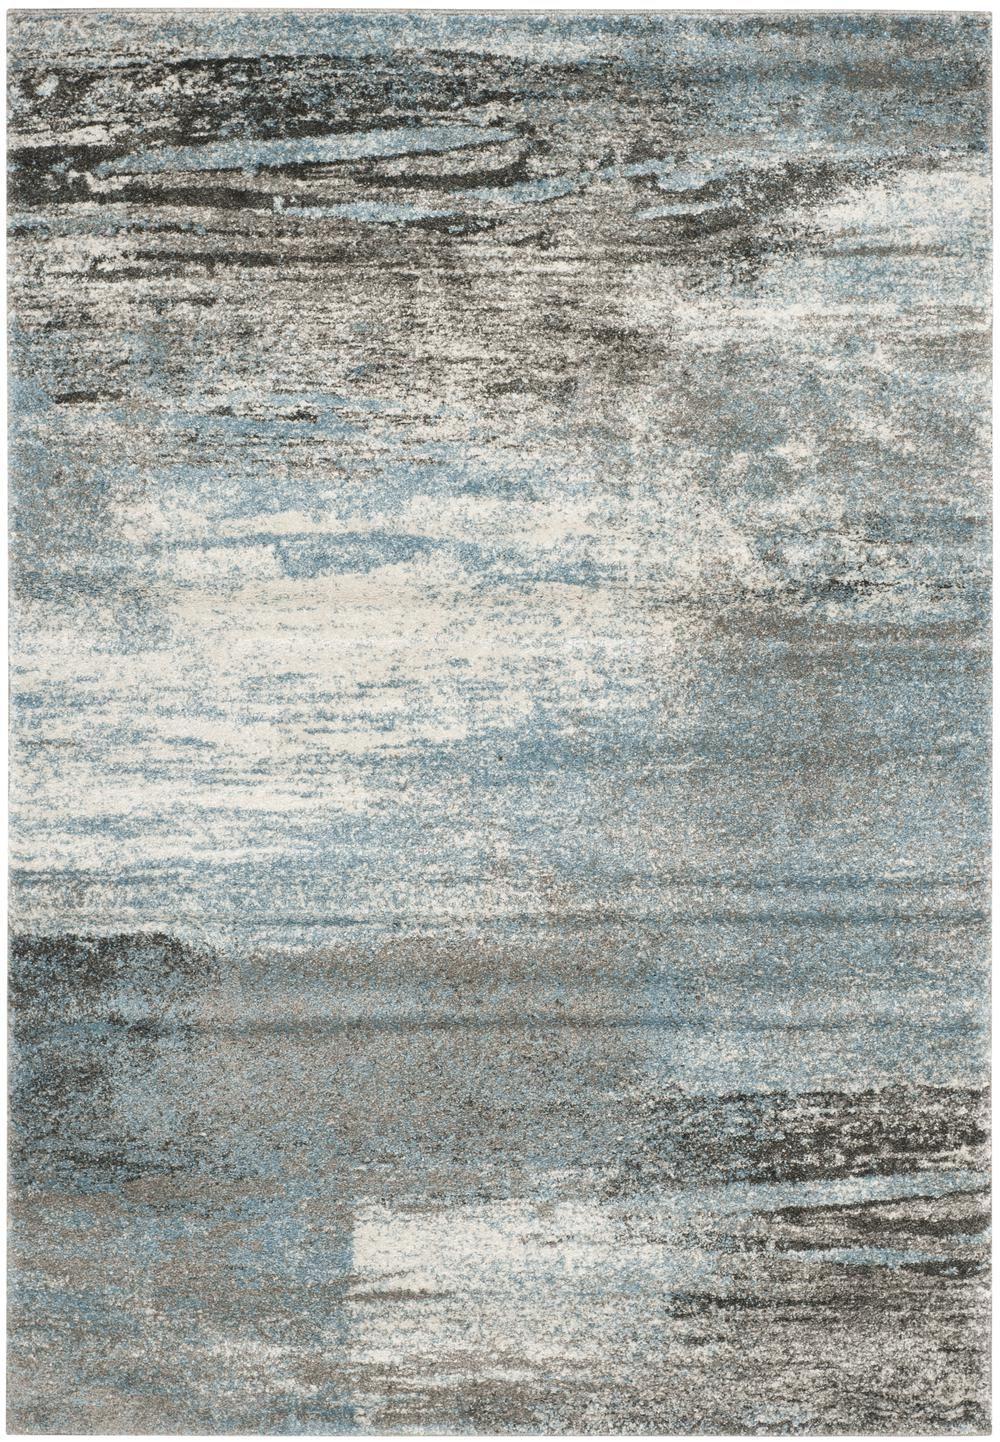 Decor With Blue Area Rugs Darbylanefurniture Com In 2020 Light Blue Rug Textured Carpet Blue Grey Rug